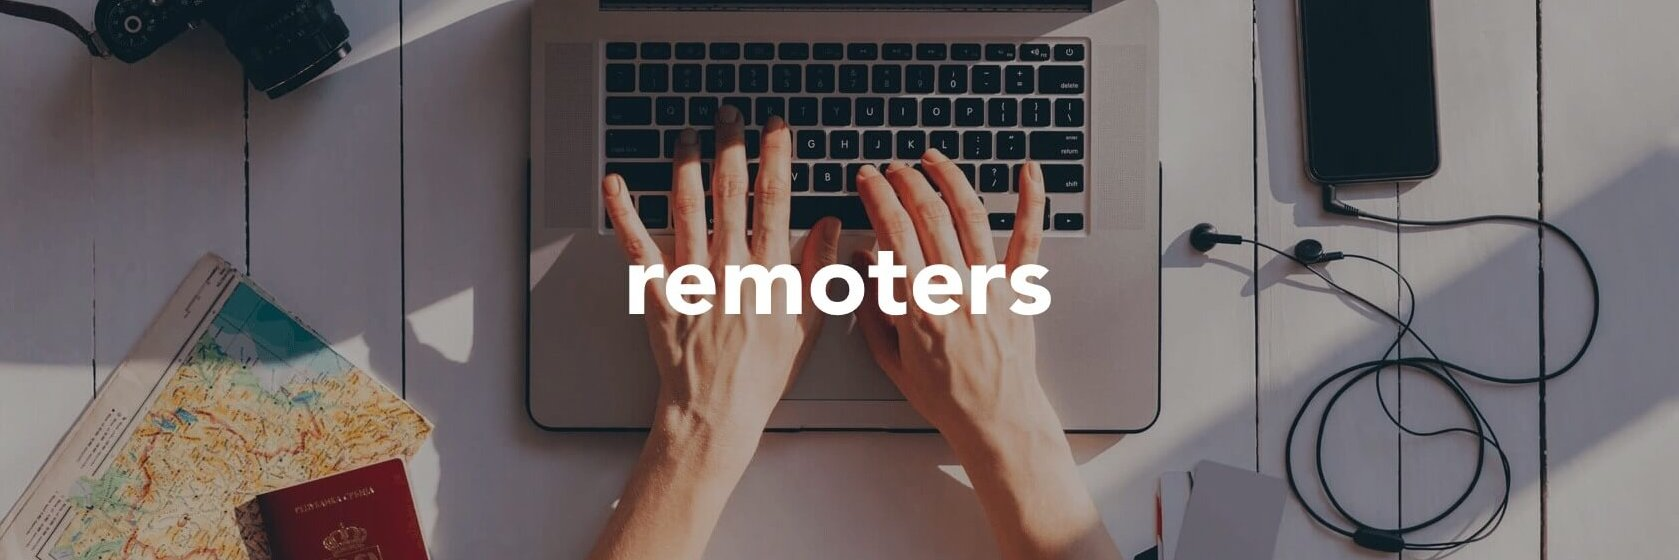 remotersnet